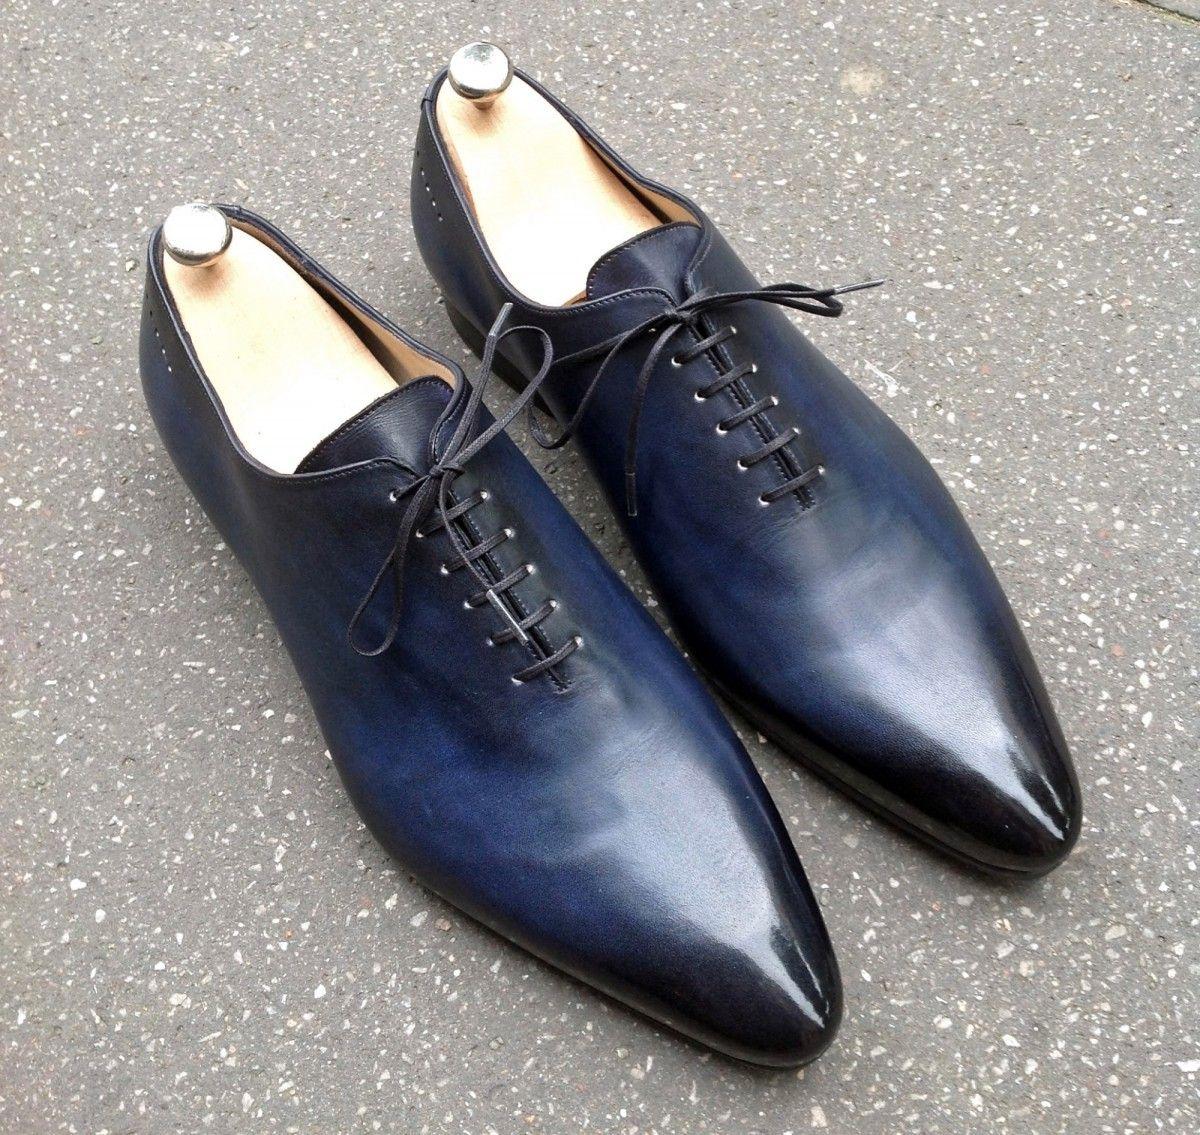 5c1f39979 Caulaincourt shoes - One cut 1773 - prussian blue